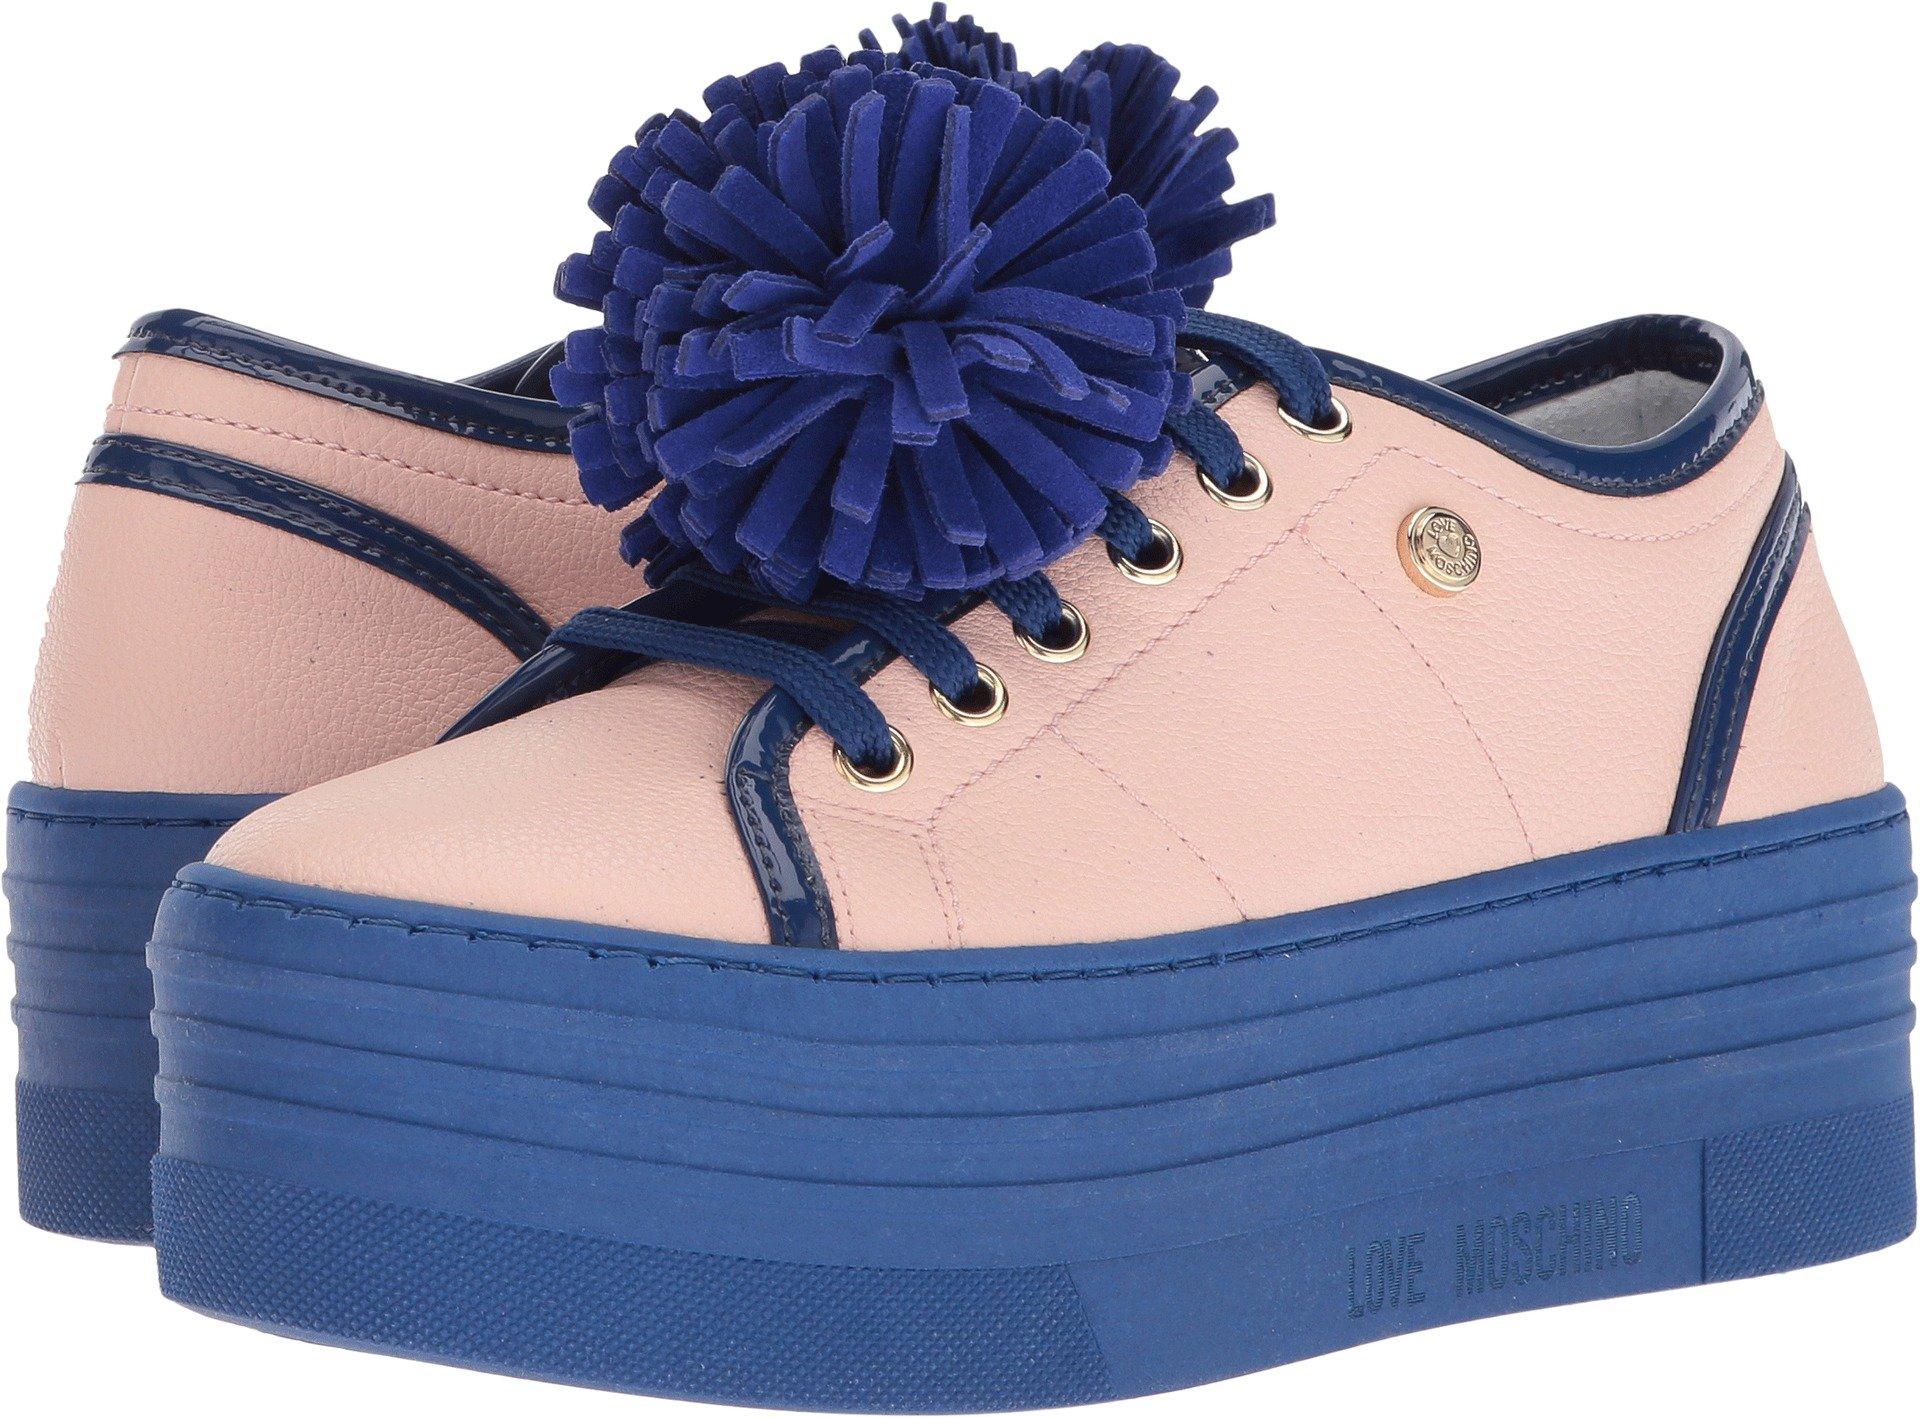 Love Moschino Women's Platform Sneakers Pink/Black 38 M EU